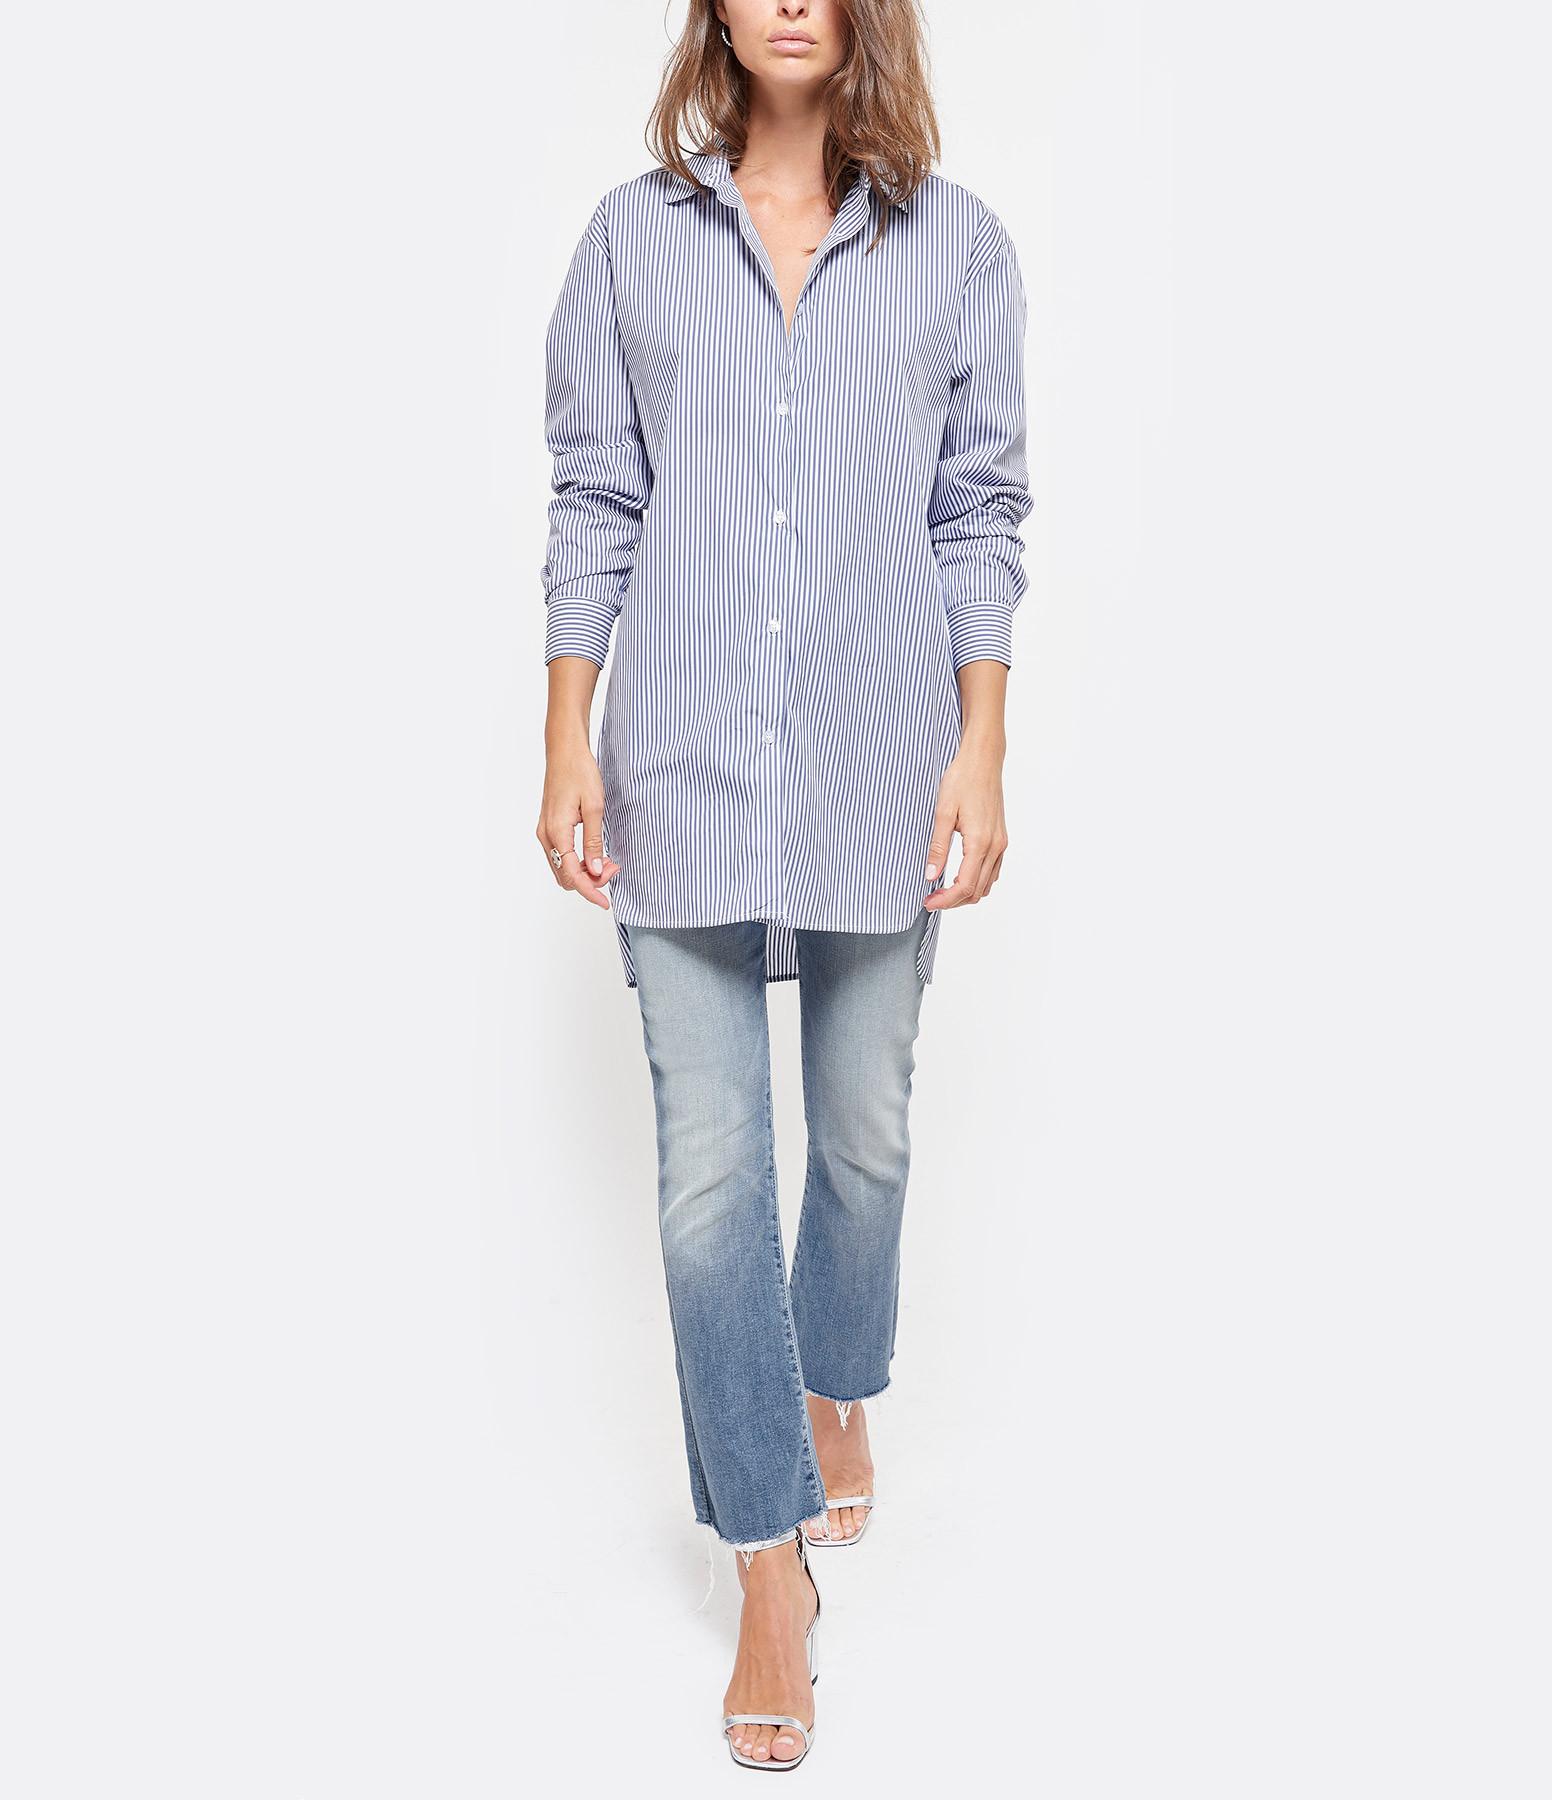 JEANNE VOULAND - Chemise Loose Dara Rayée Bleu Blanc